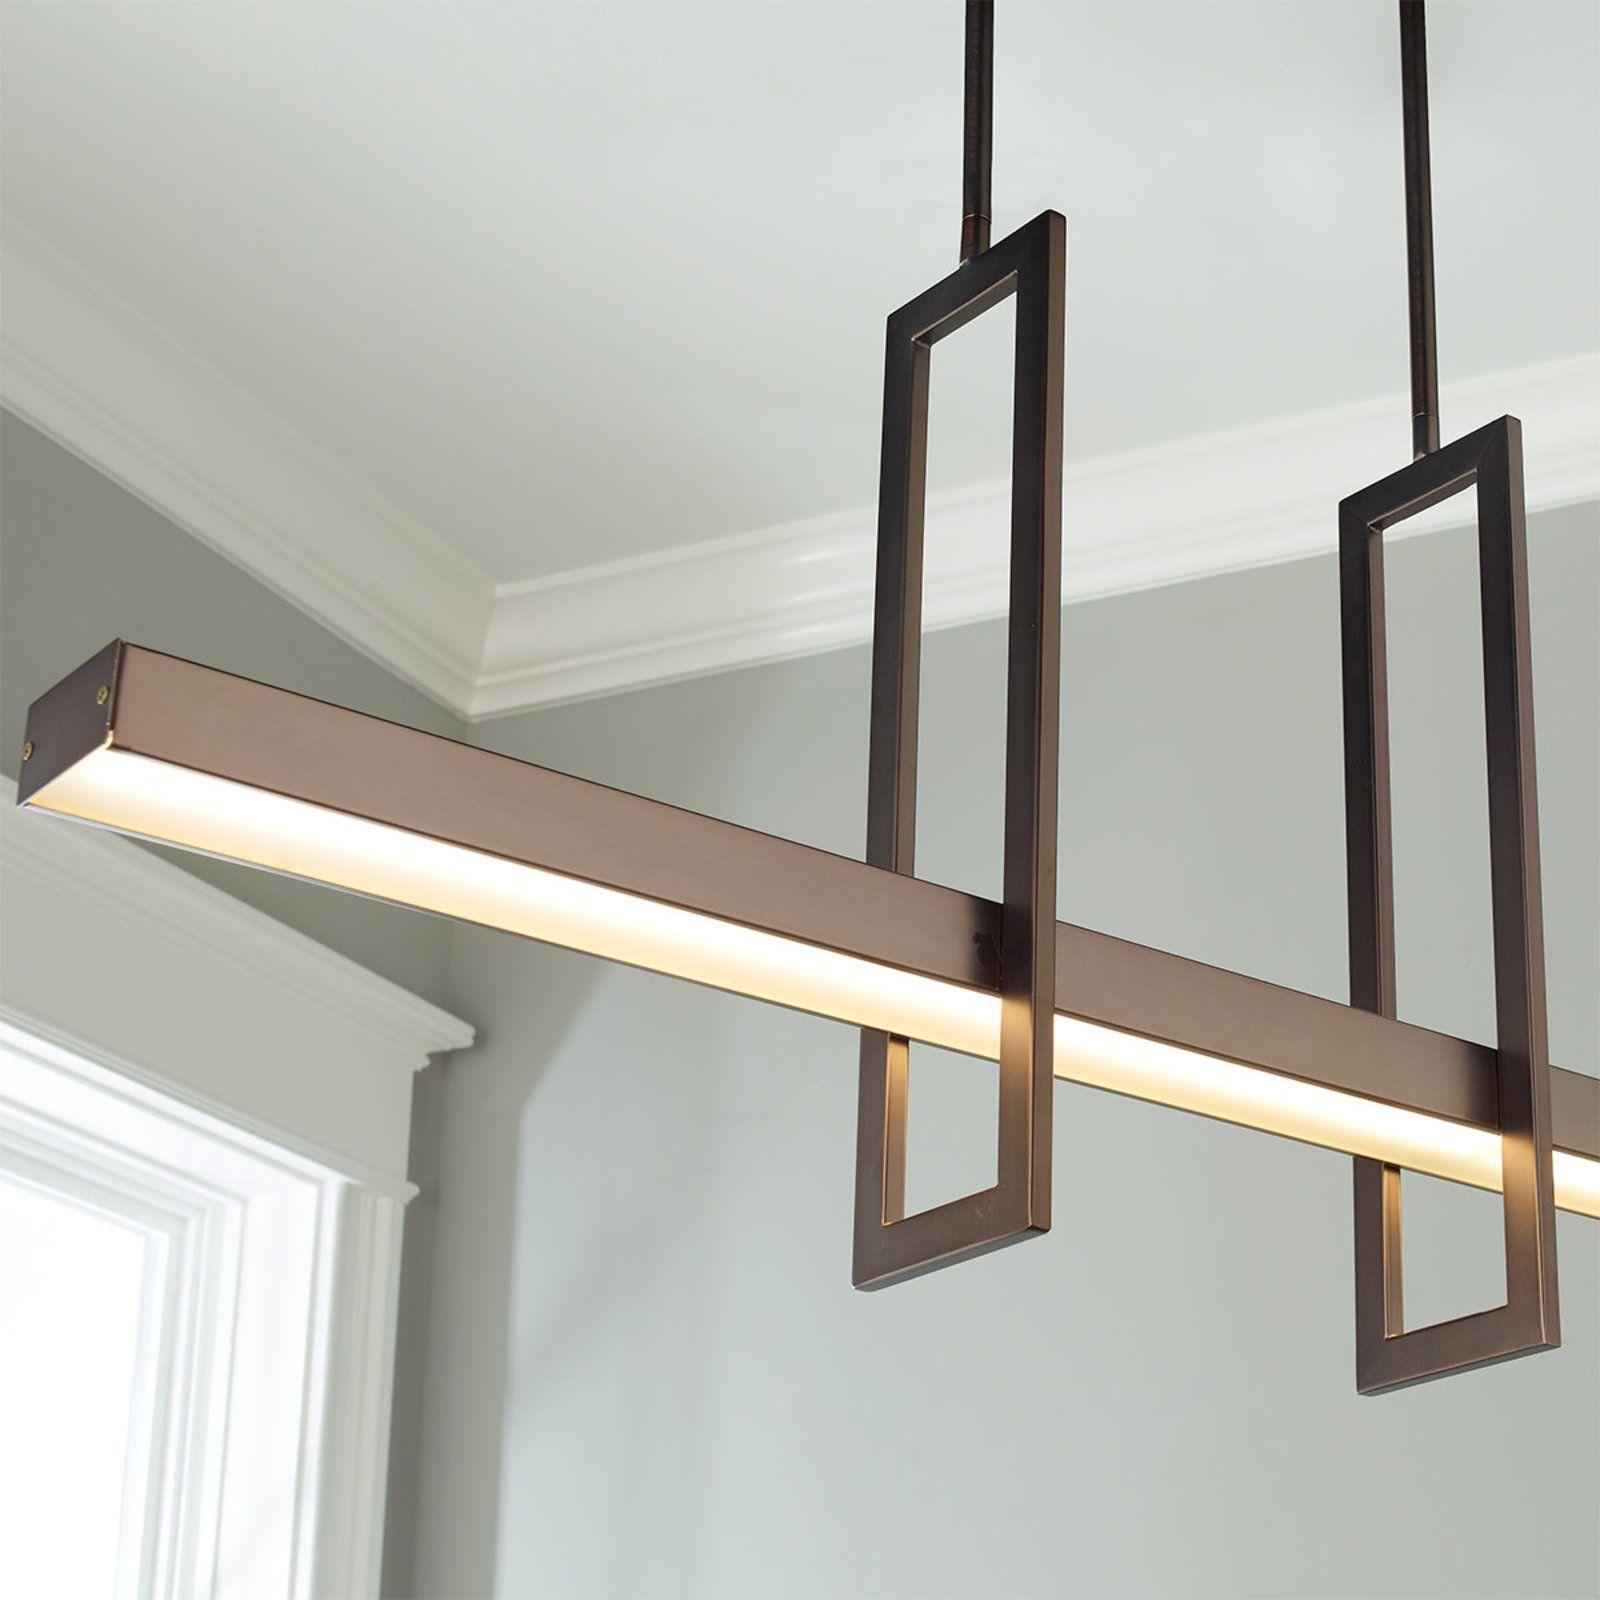 Energy Efficient Modern Balance Beam LED Linear Chandelier ChandelierChandelier ShadesDining Room LightingDining